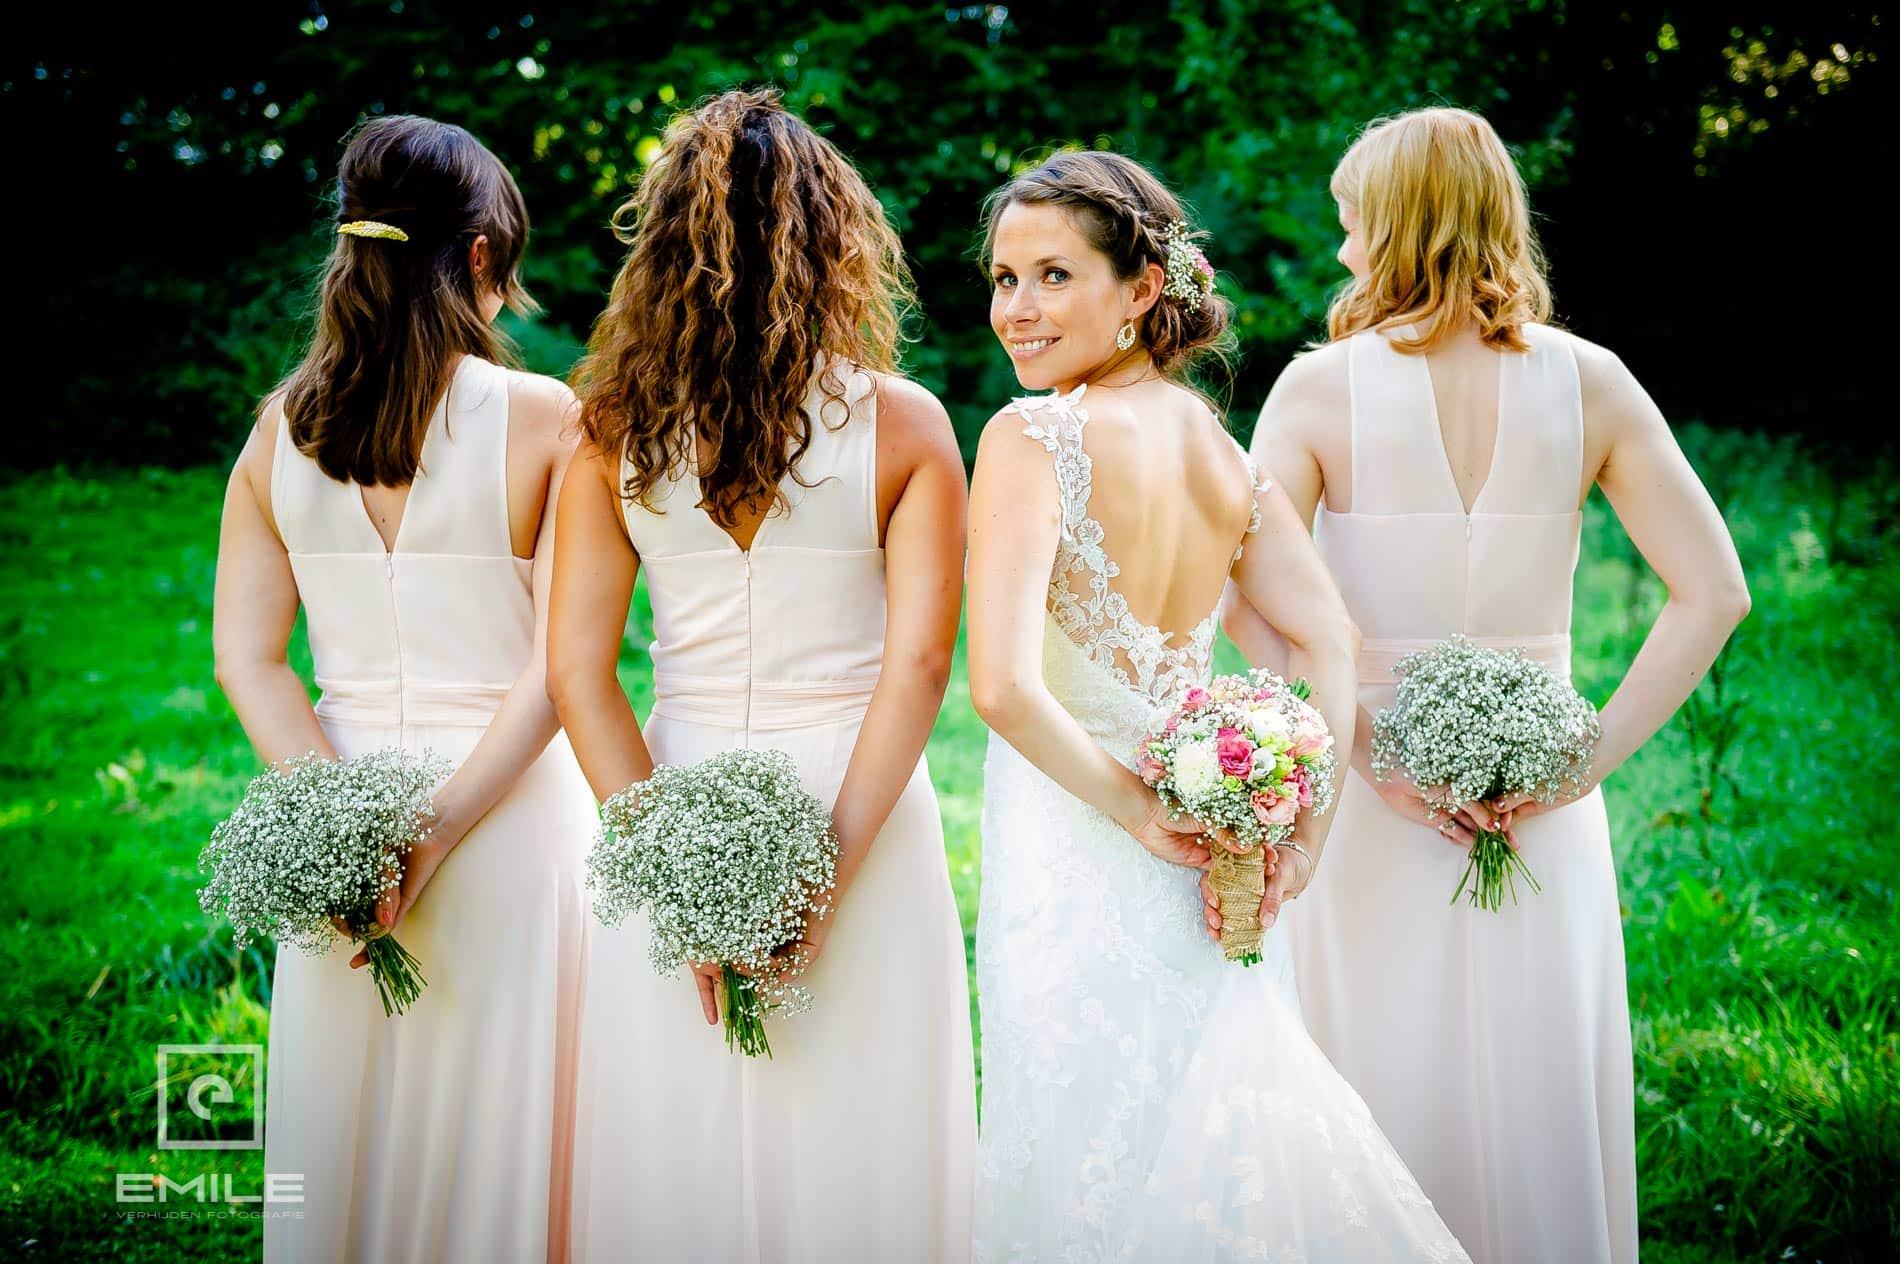 Bruidsmeisjes met boeket op rug, bruid kijkt achterom